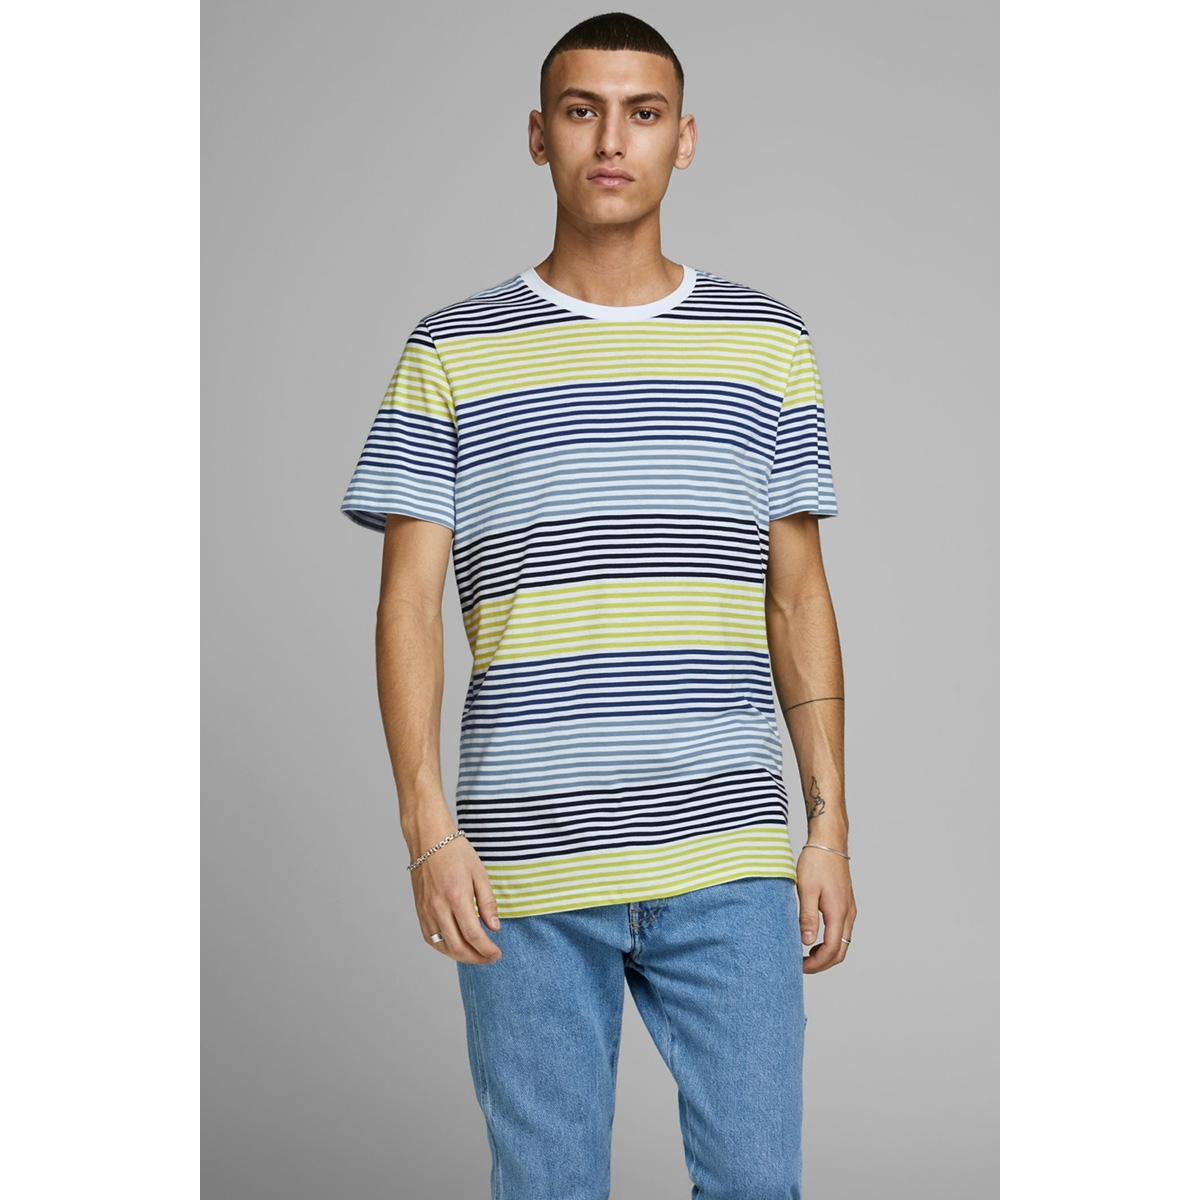 jcoaraf tee ss crew neck 12170181 jack & jones t-shirt sulphur spring/slim